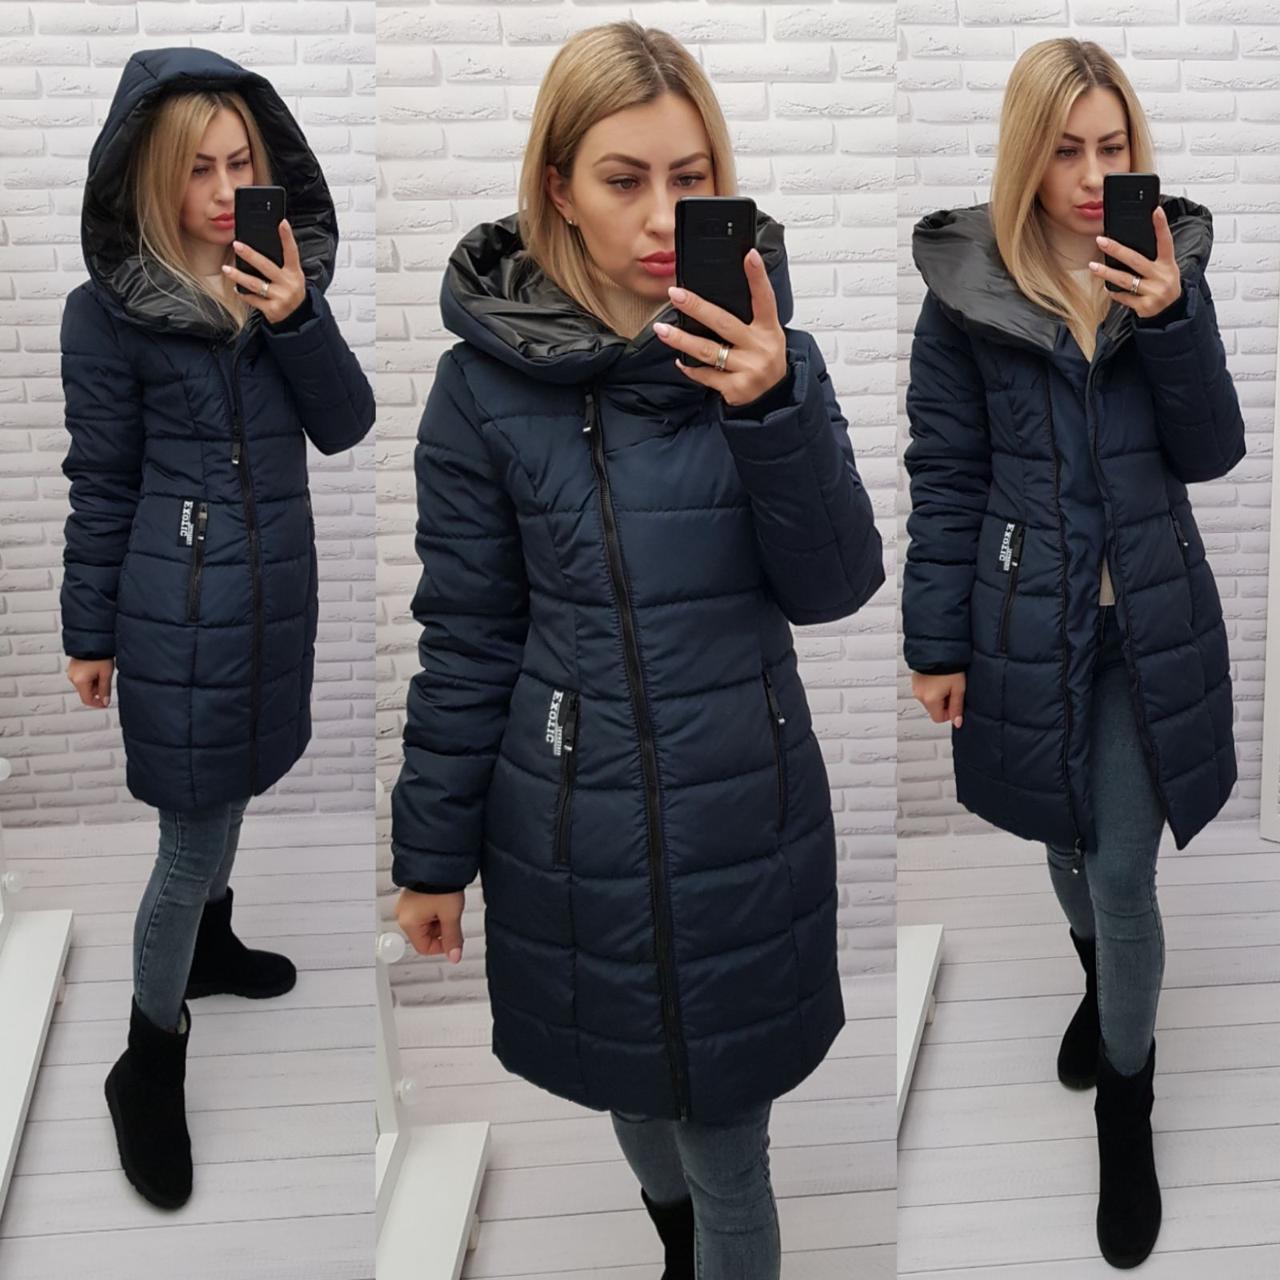 Зимняя куртка-пуховик женская 2021, арт 414, цвет темно-синий